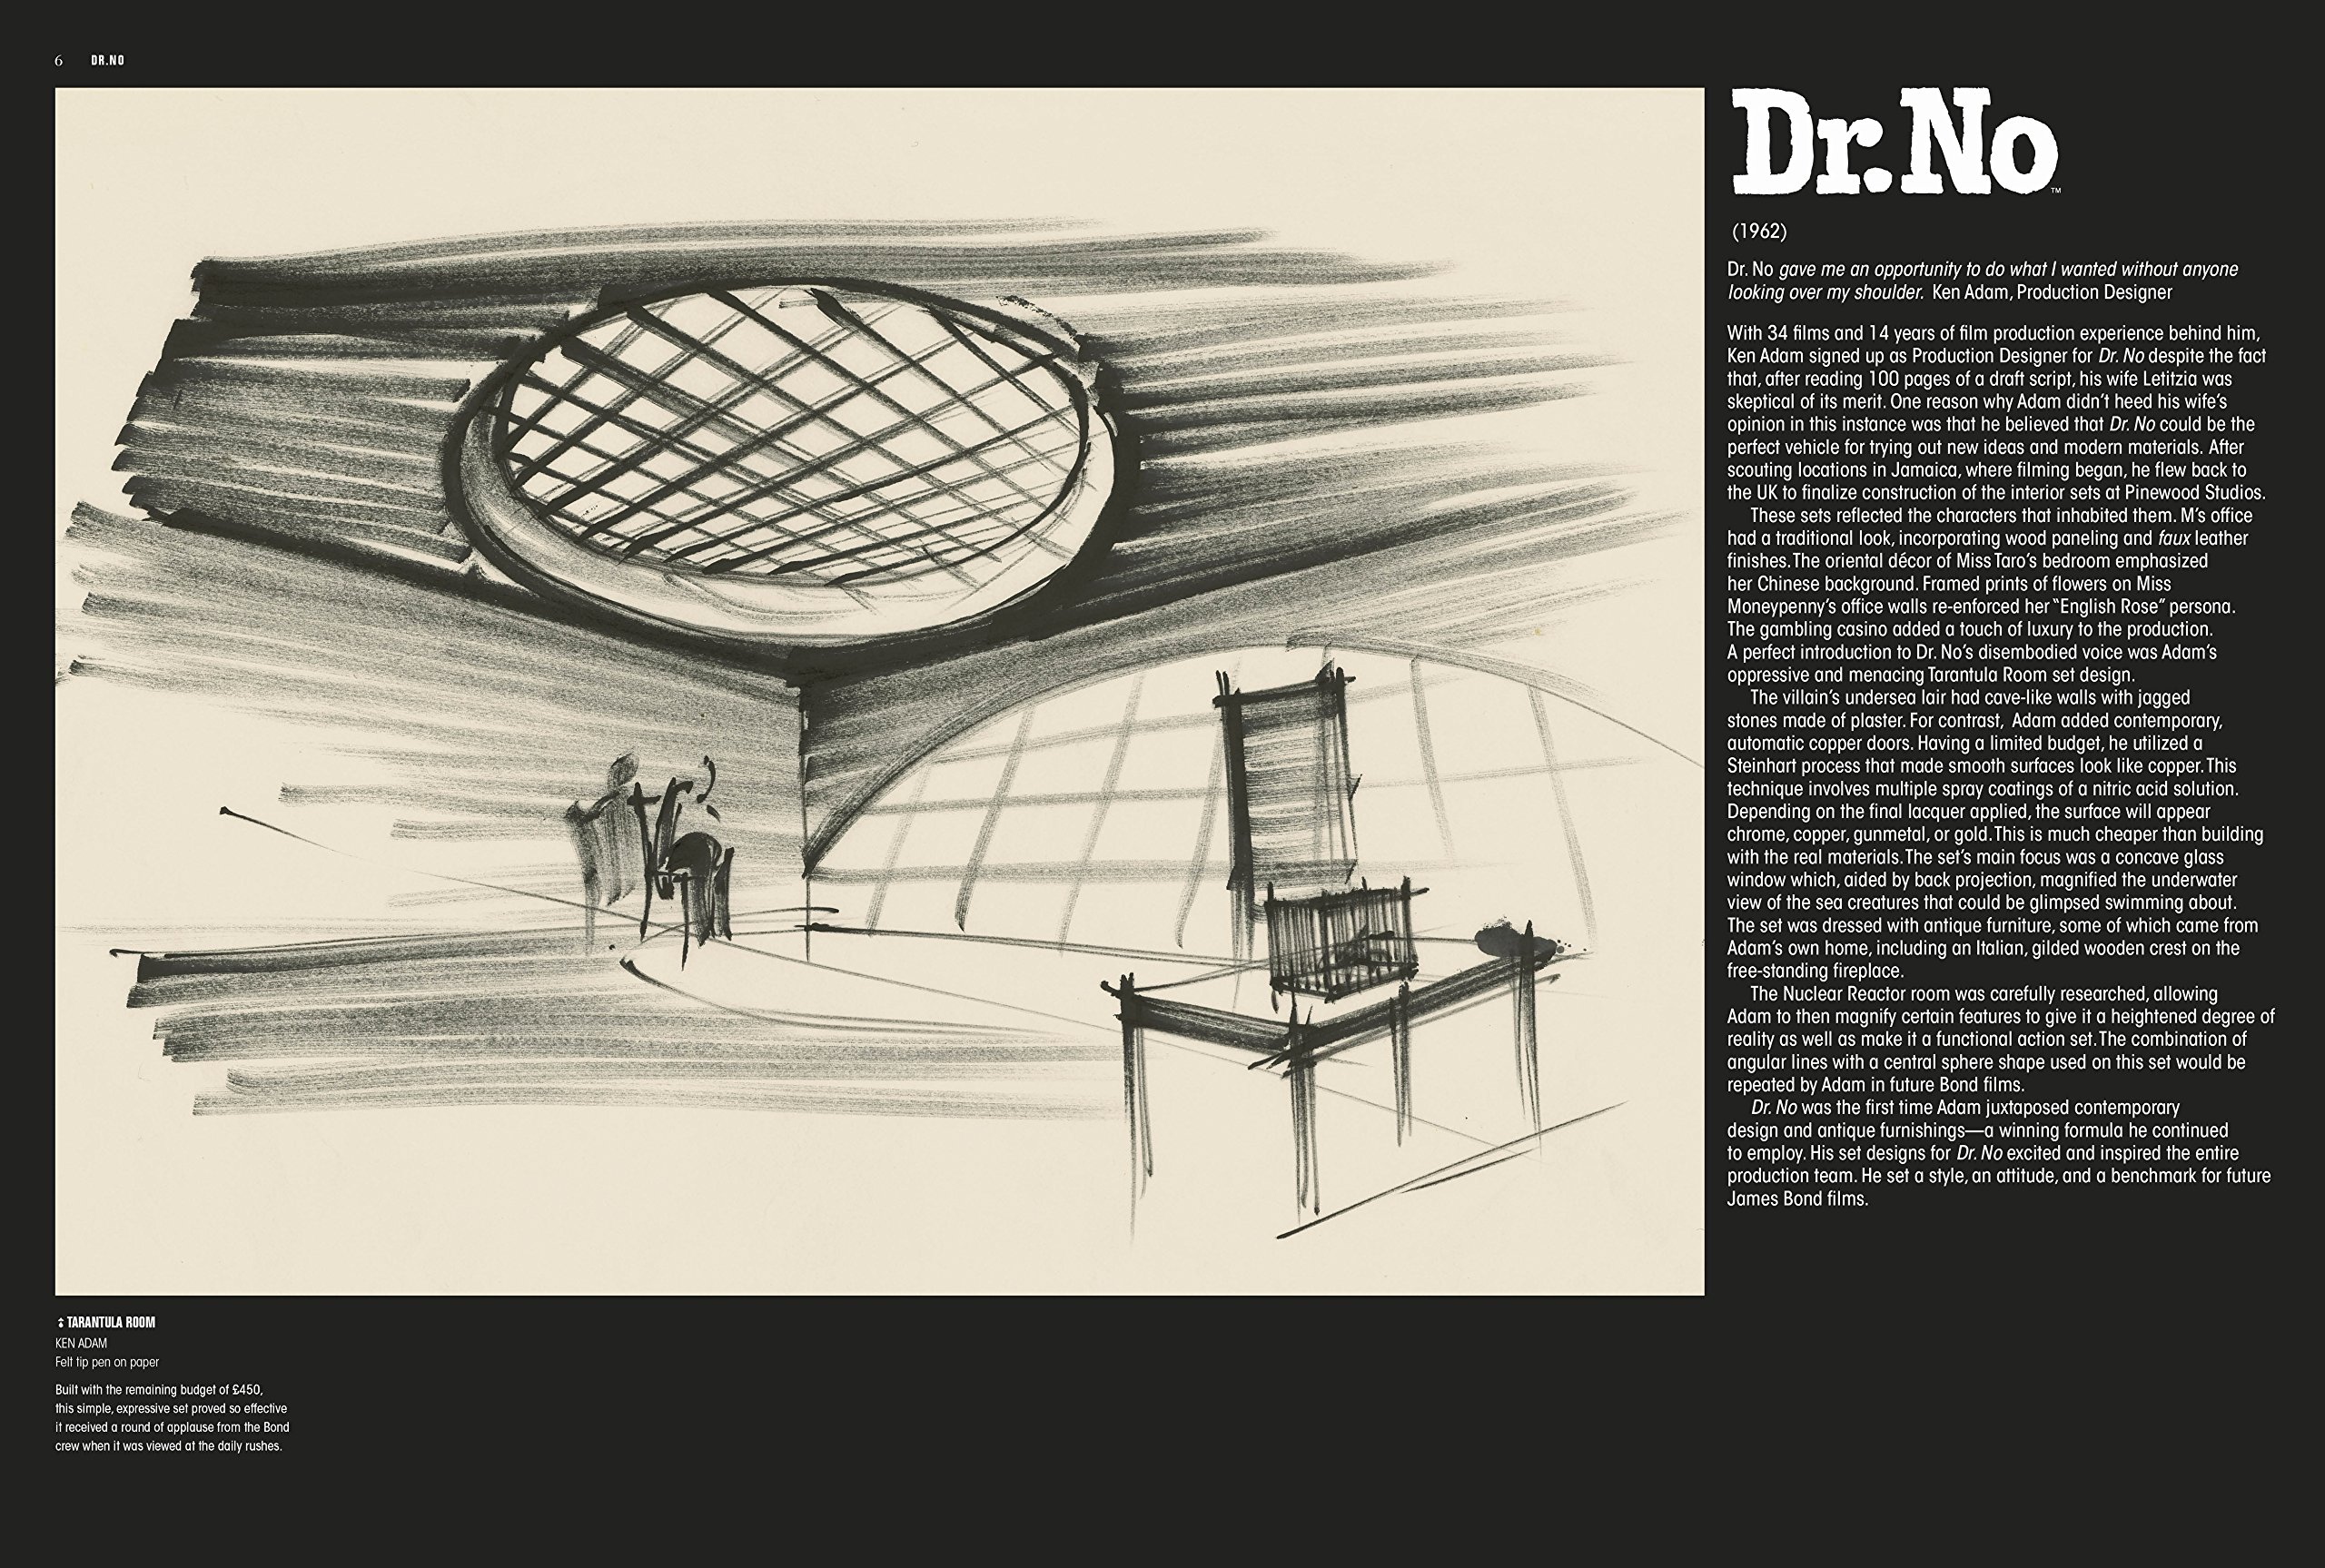 Debonaire Design And Build